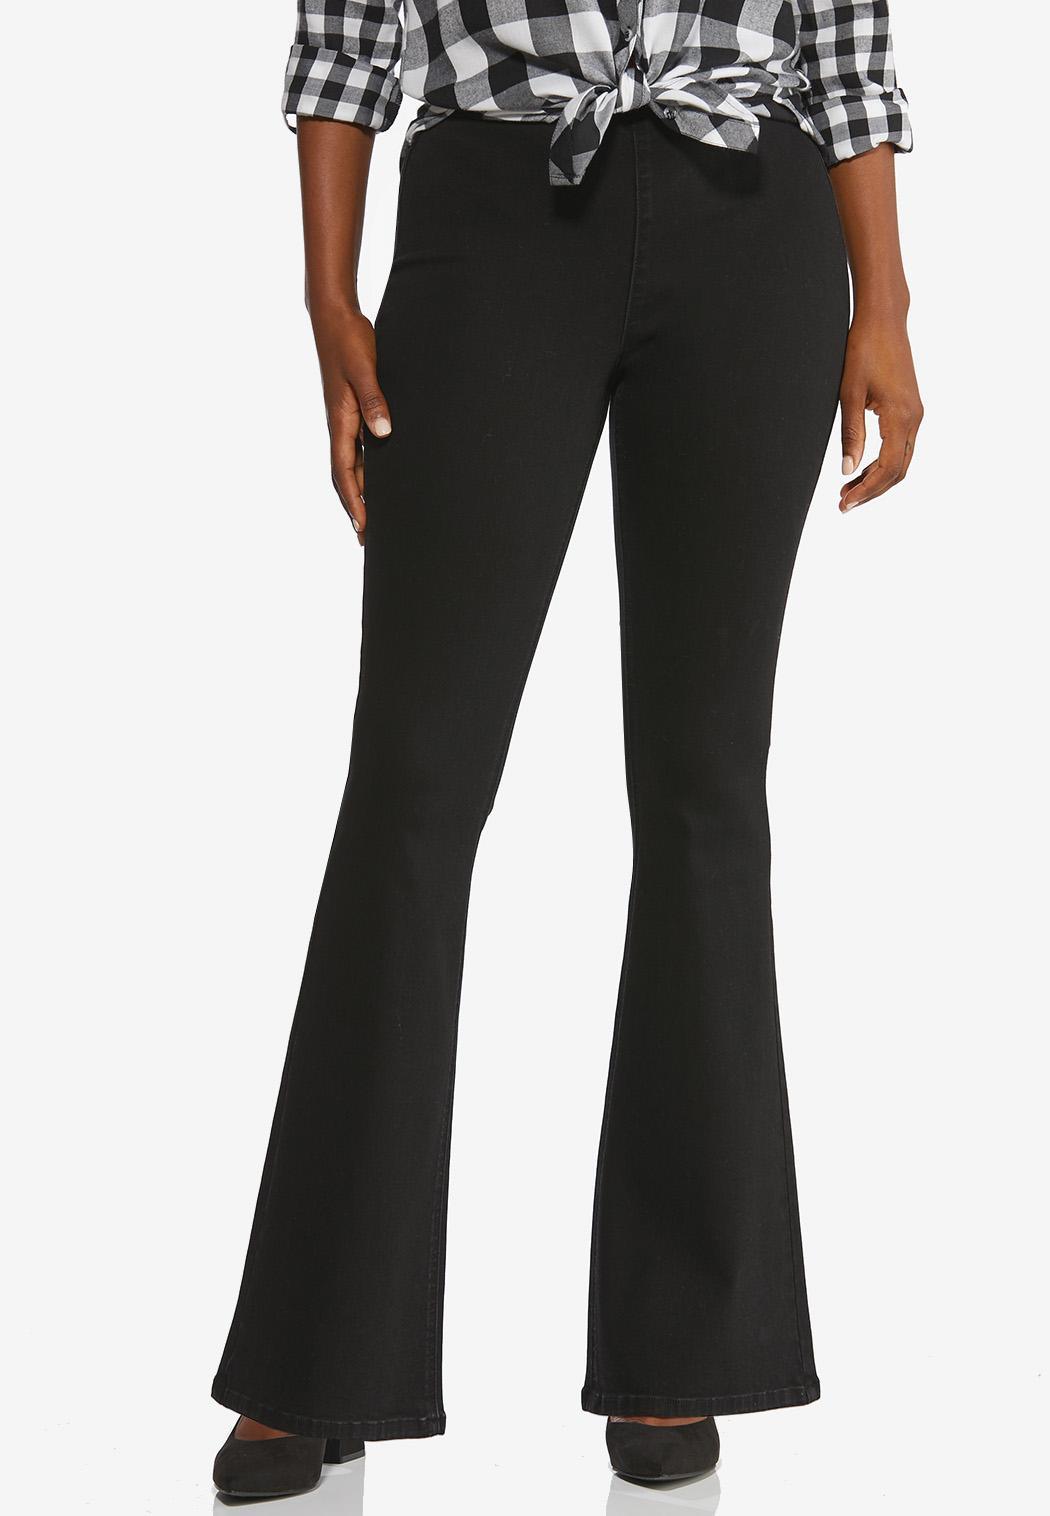 Black Pull-On Flare Jeans